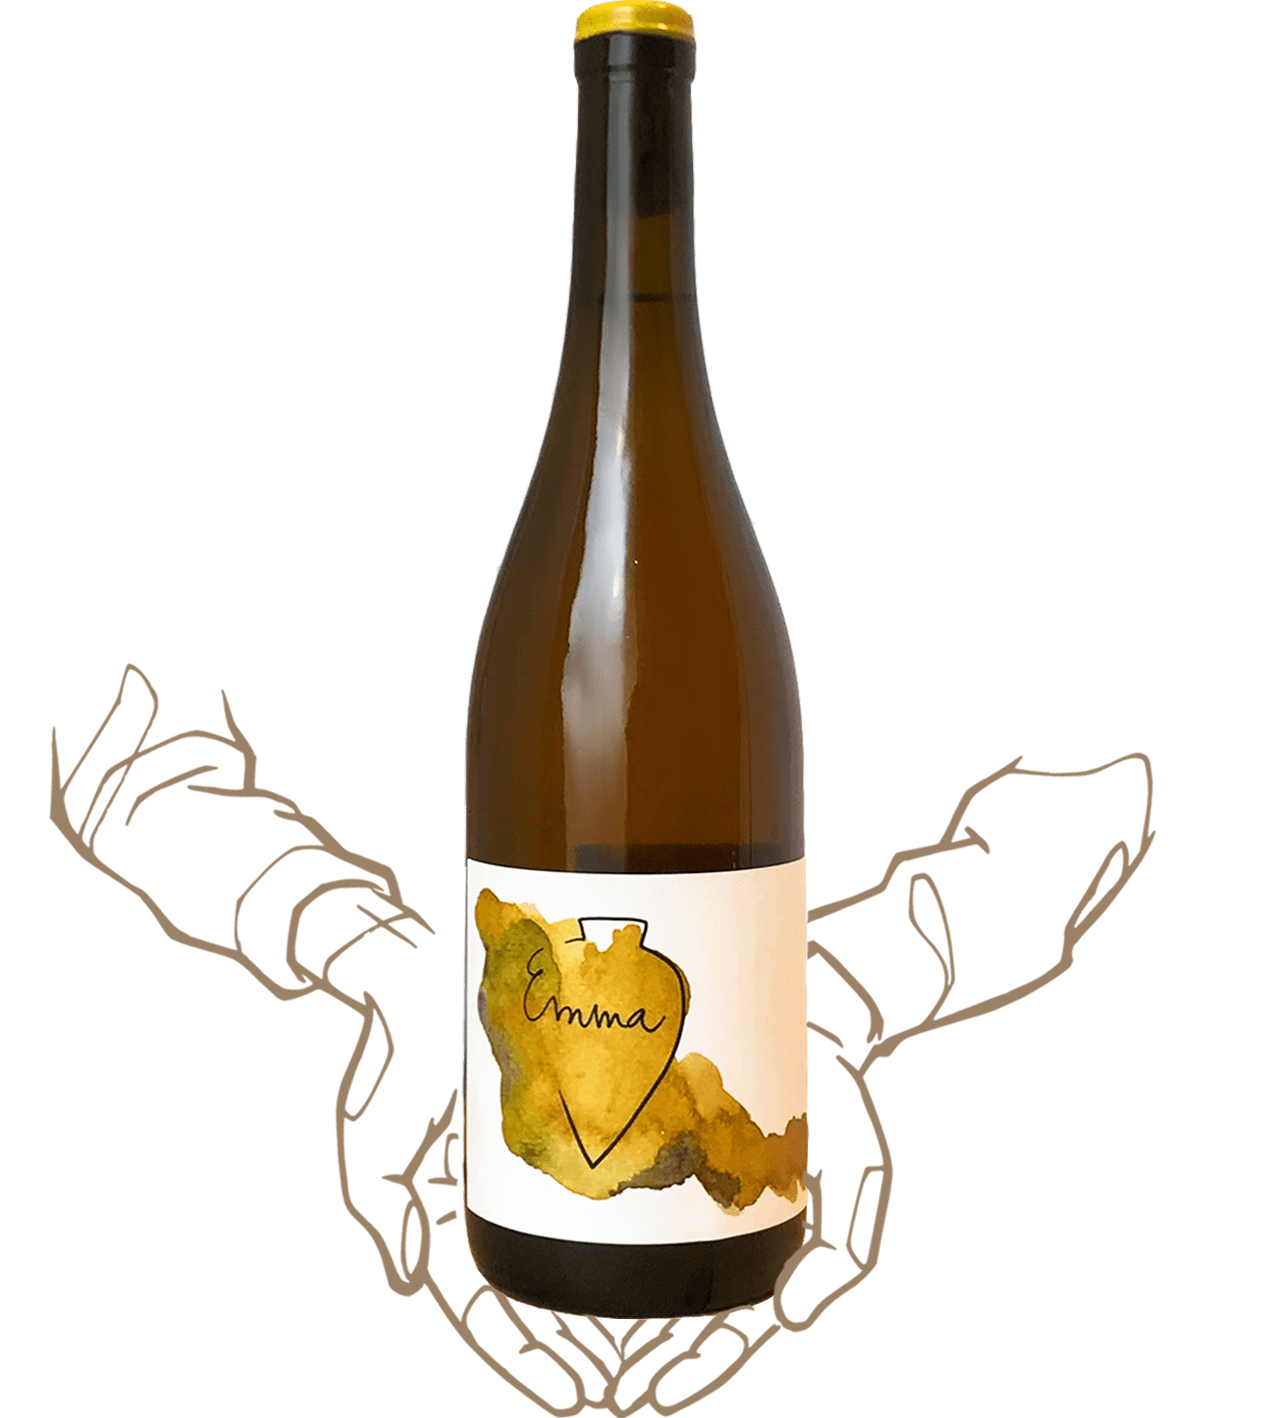 Emma riesling du domaine Vega aixala est un vin naturel catalan